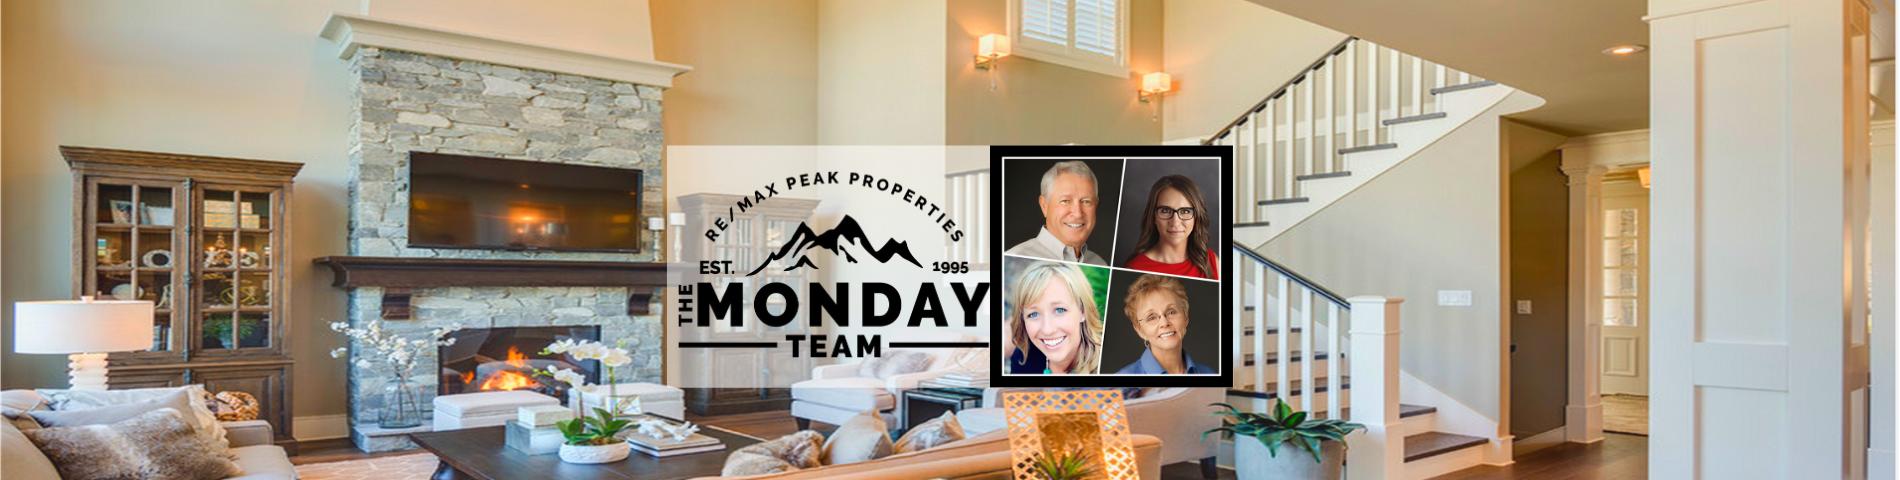 The Monday Team, RE/MAX Peak Properties